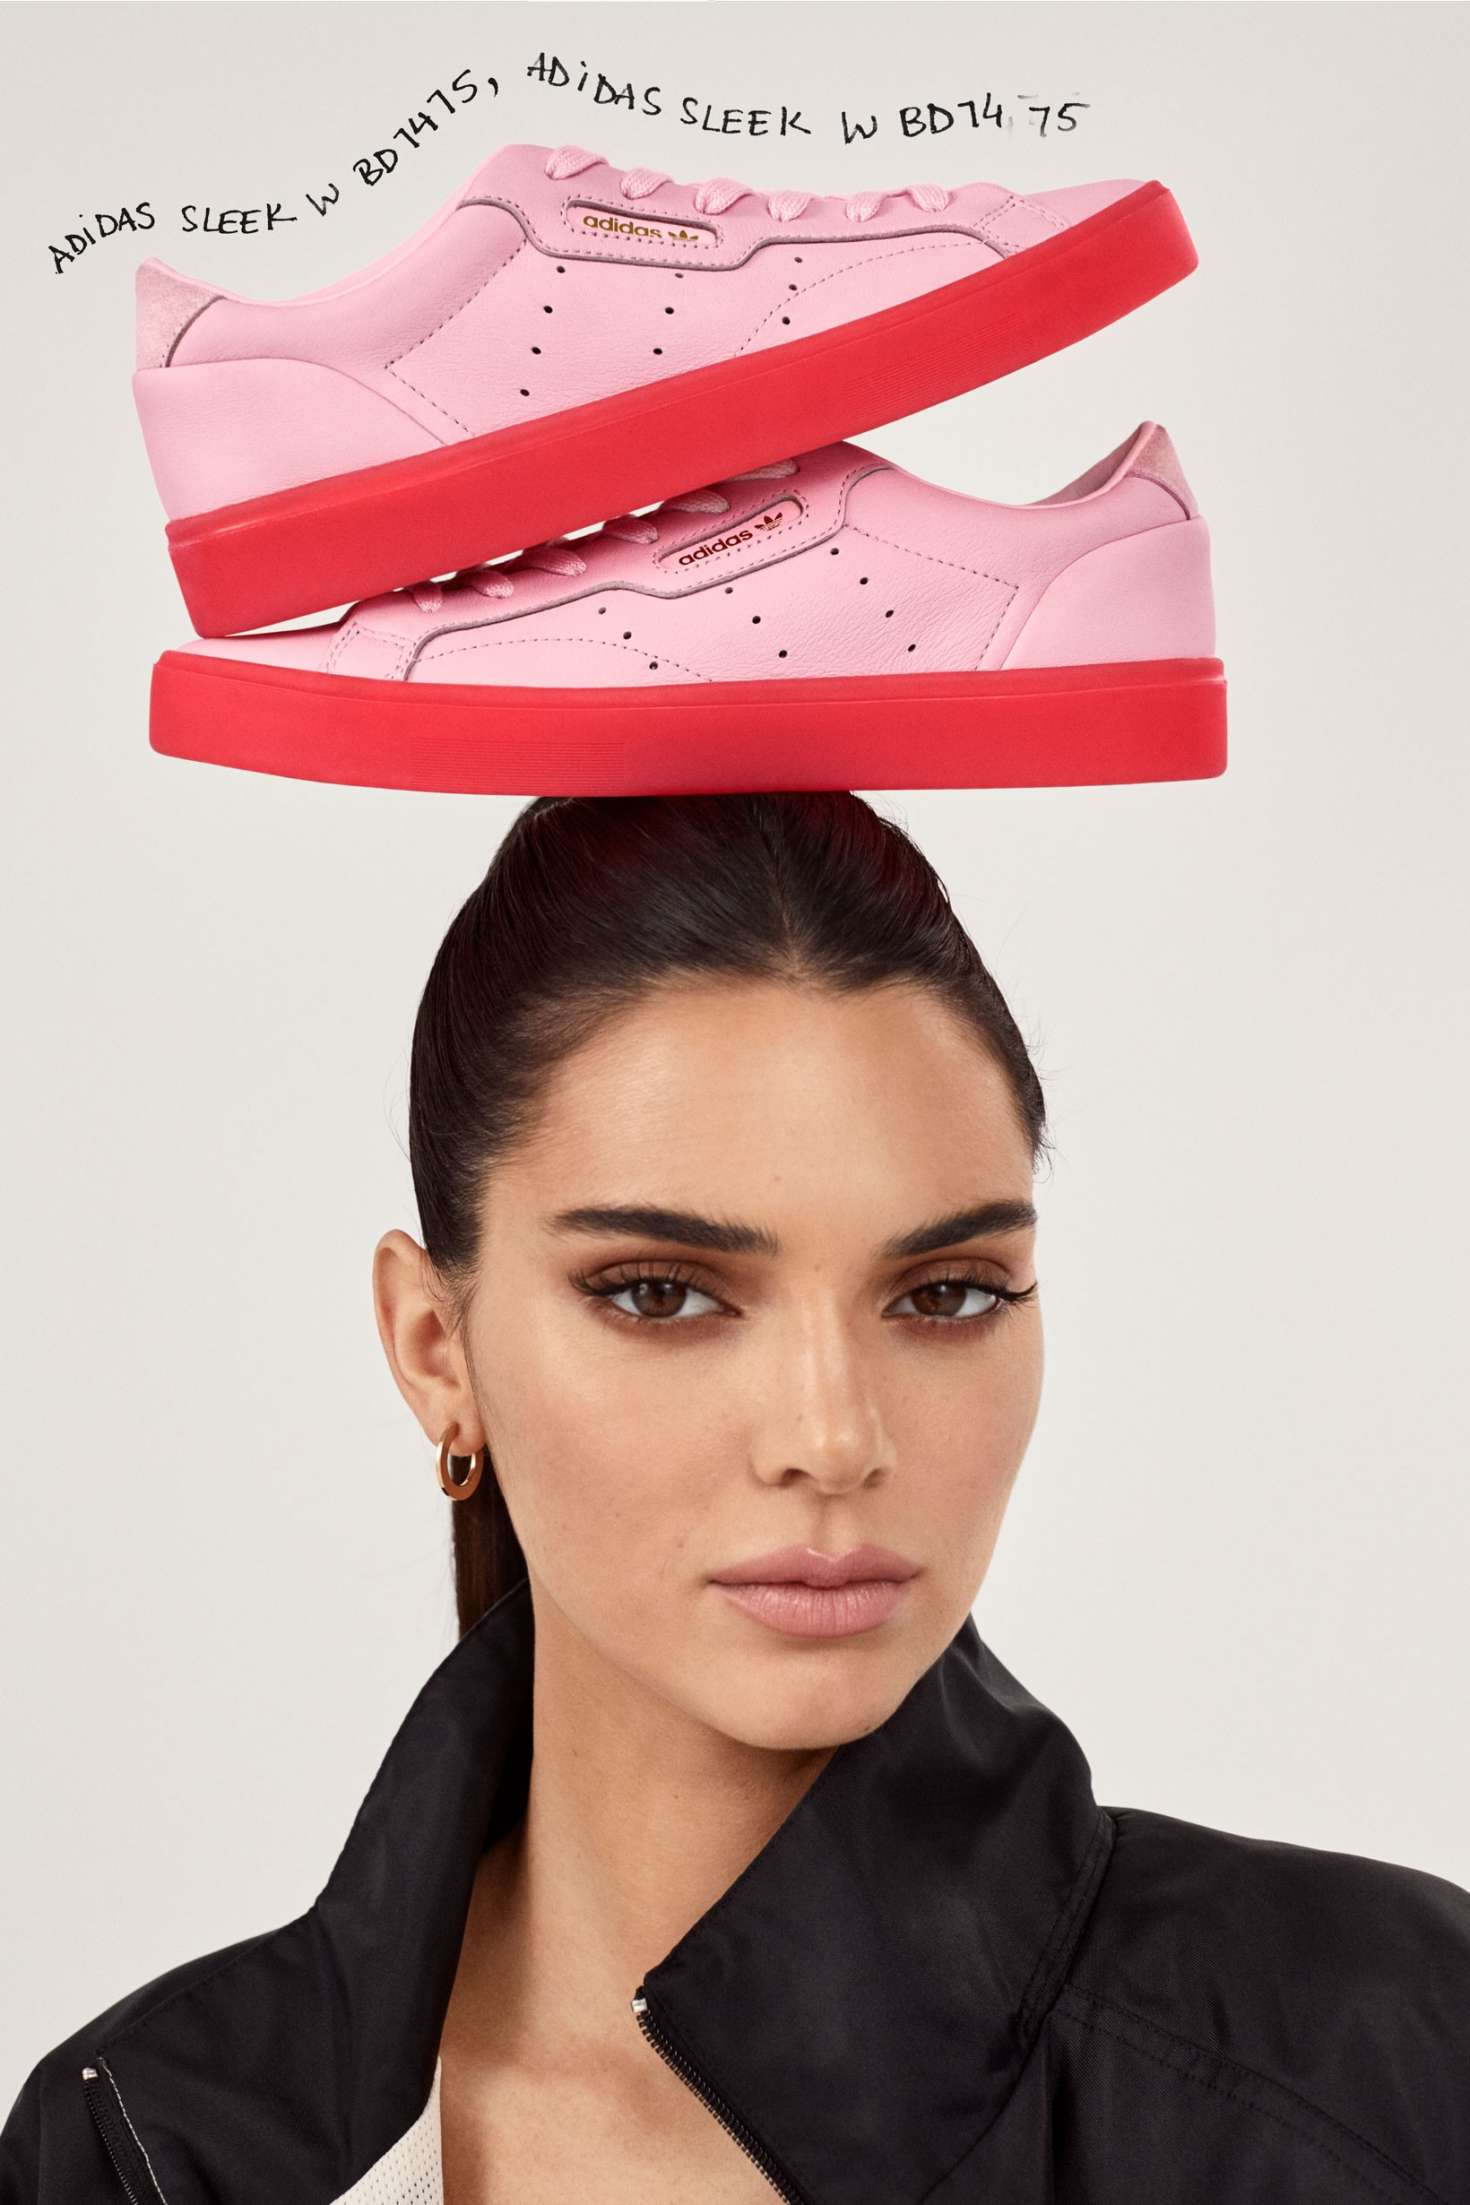 Kendall Jenner 2019 : Kendall Jenner: Adidas New Sleek Lookbook 2019 Collection -02